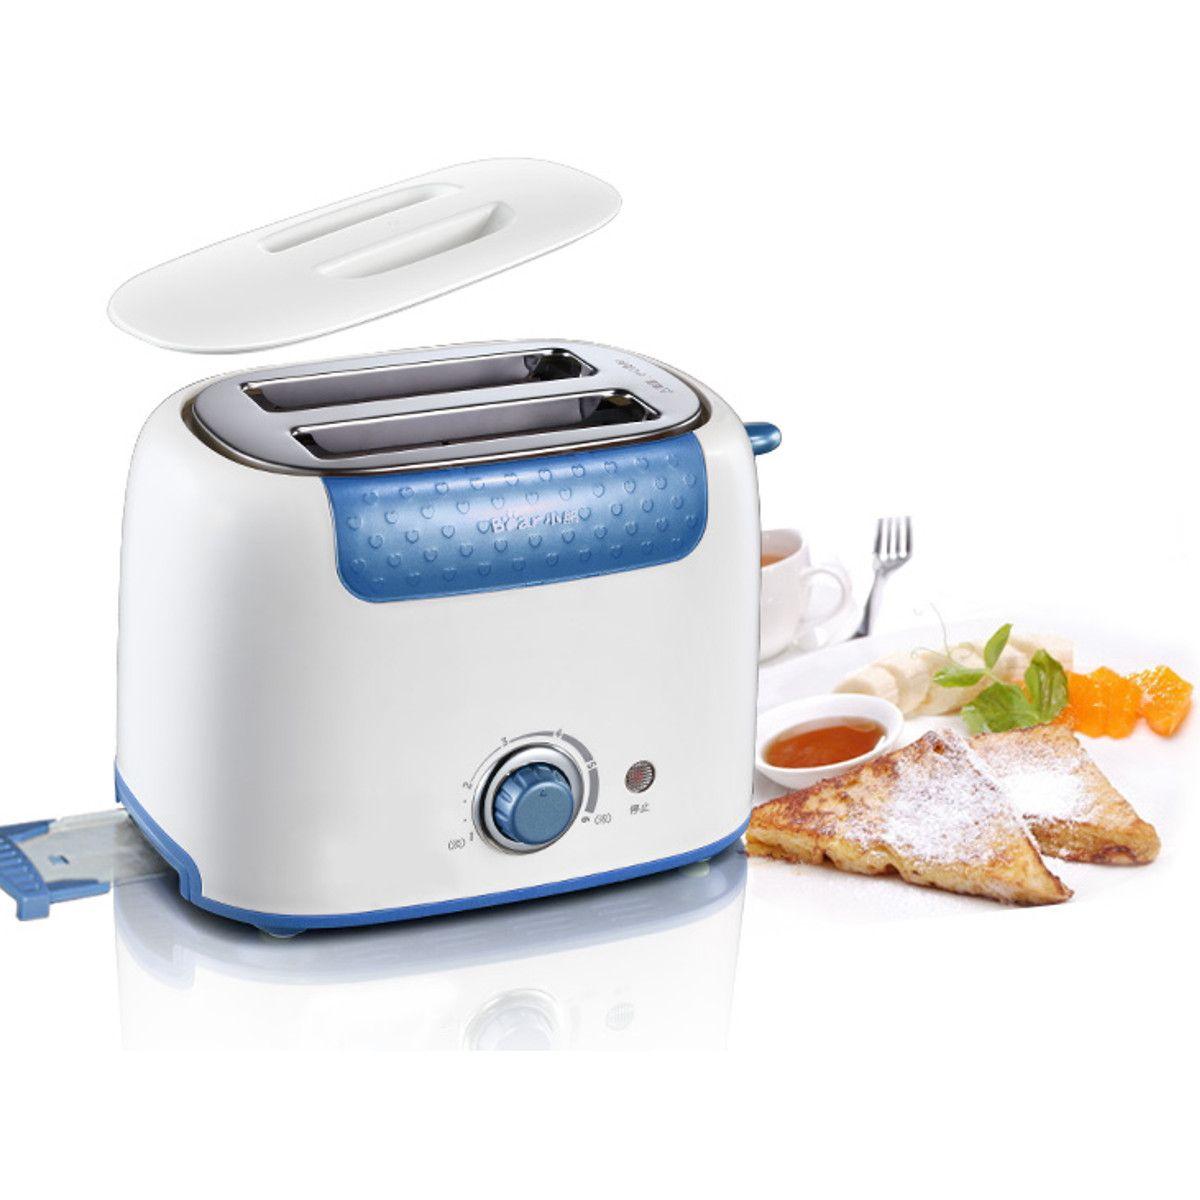 2-Slice Pan Sandwich Tostadora Cocina de acero inoxidable para ...